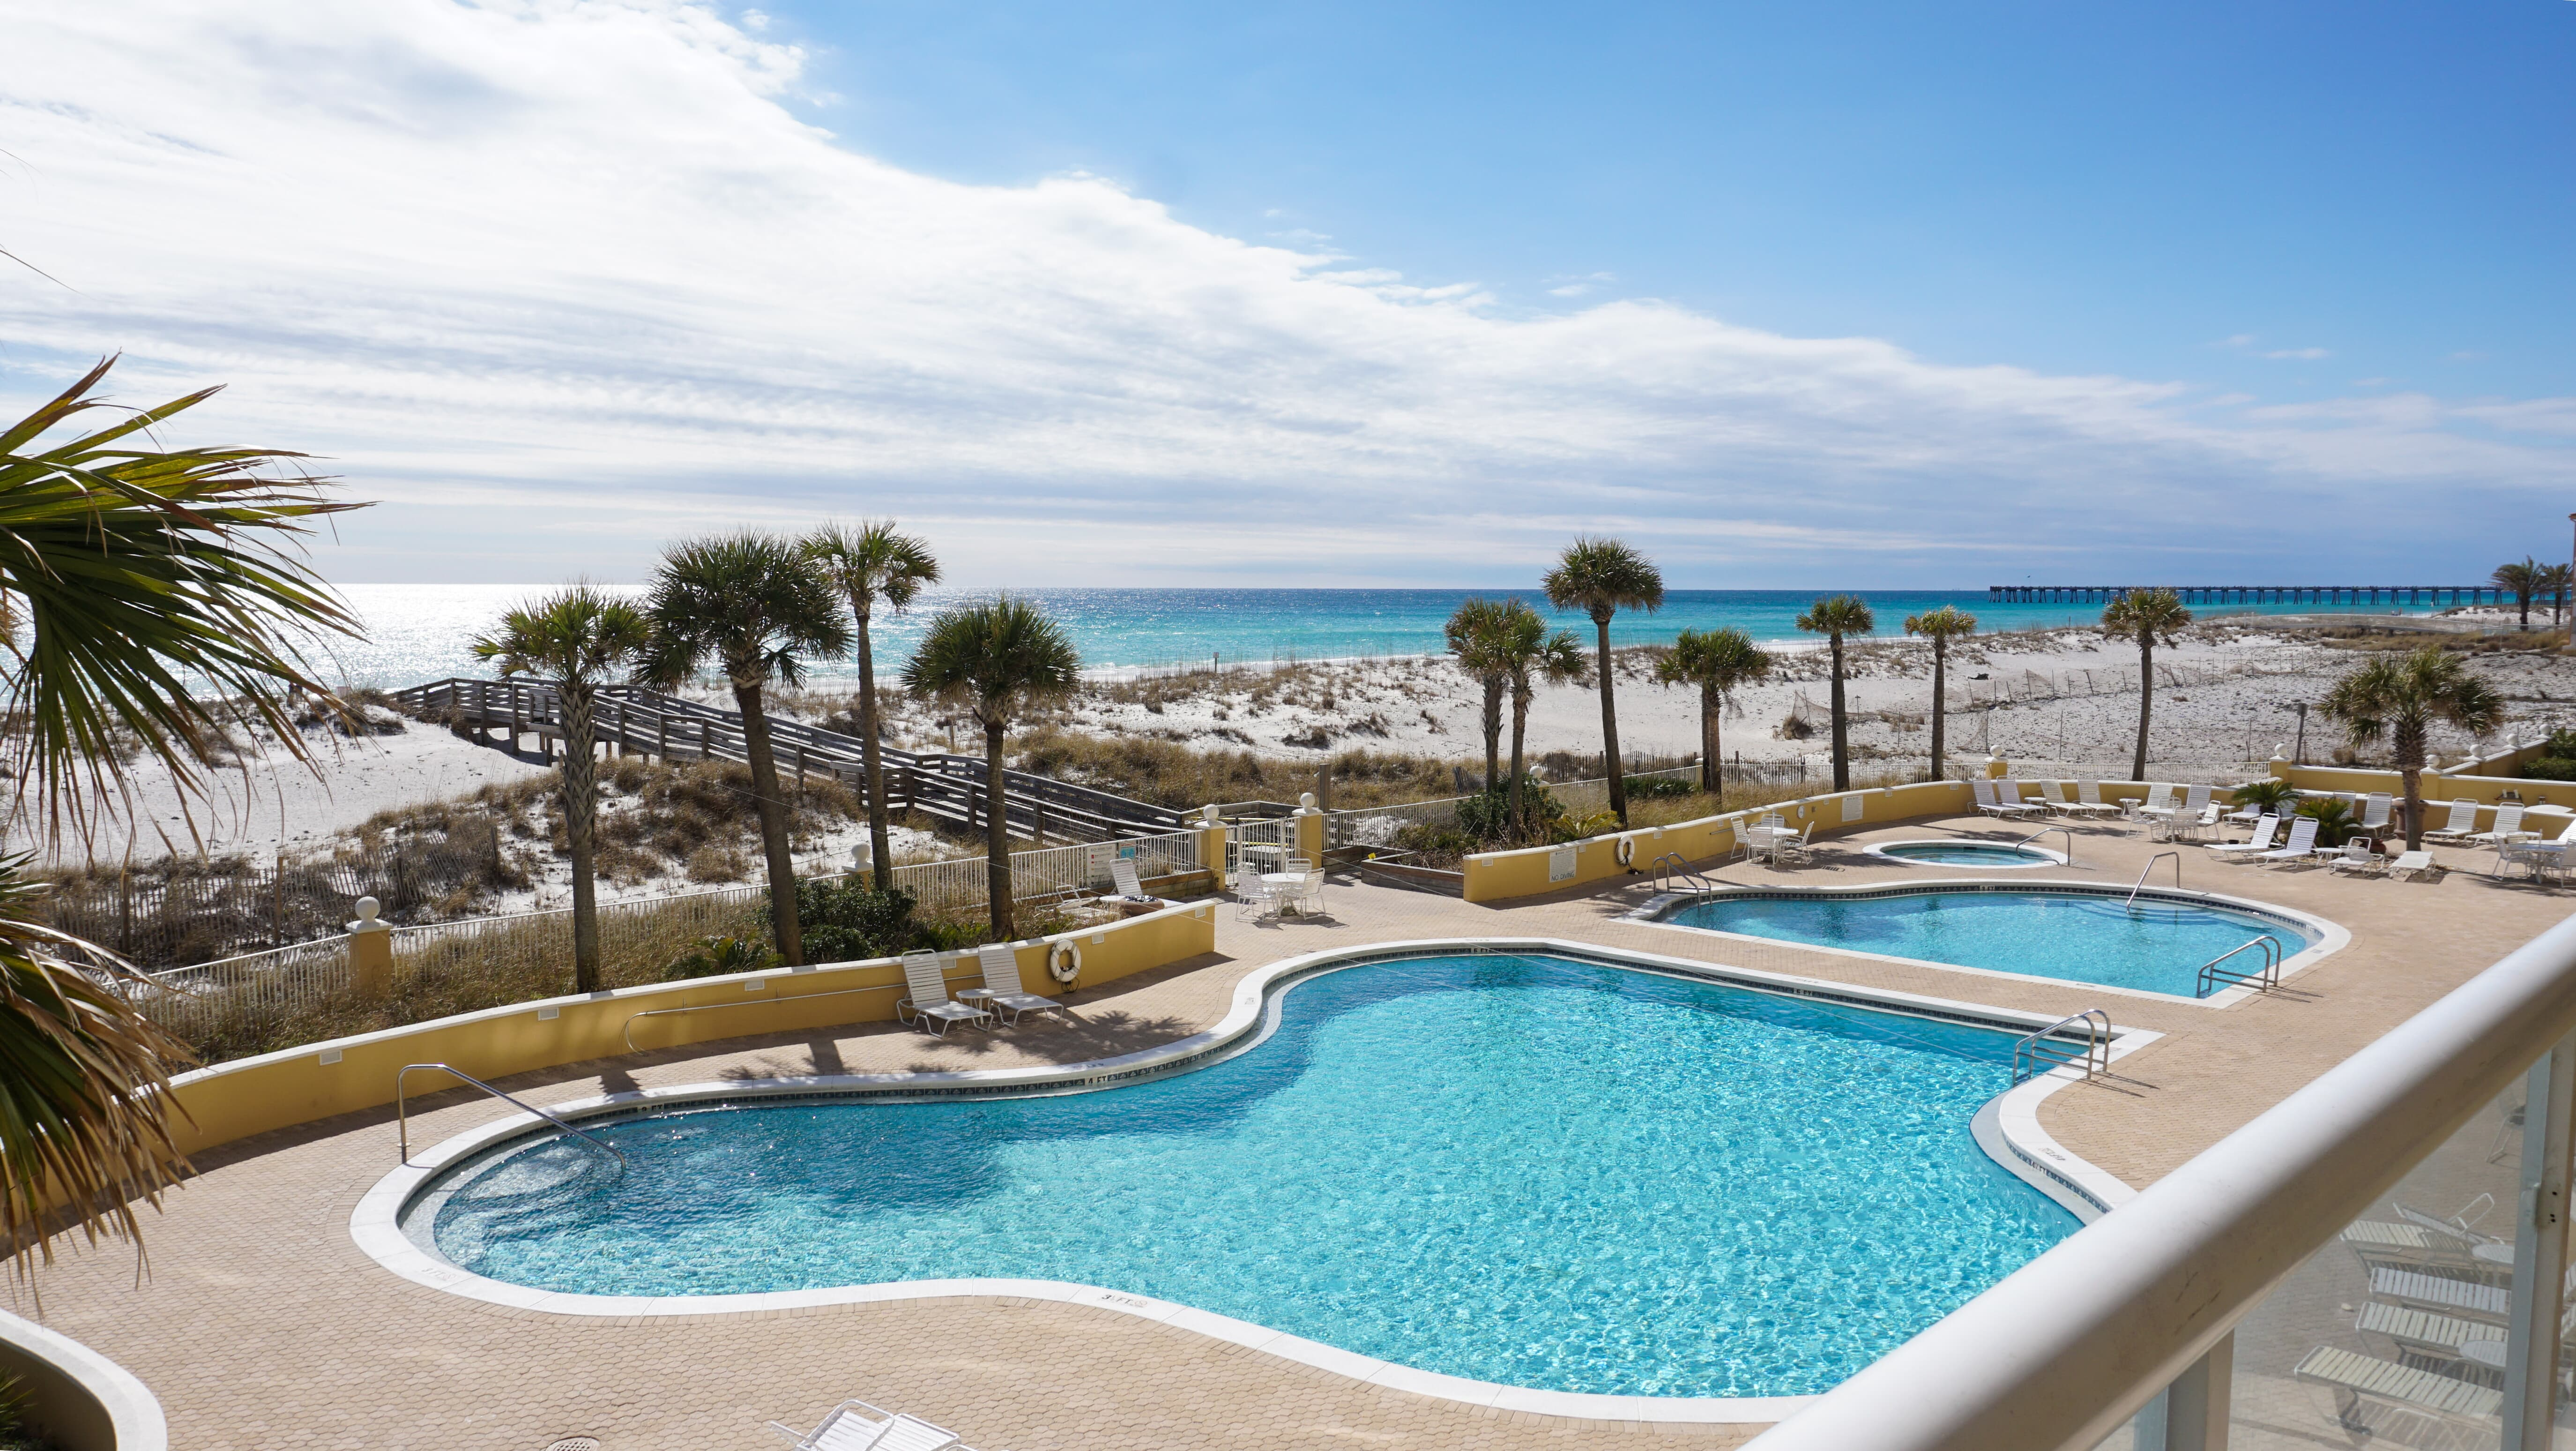 Emerald Isle #101 Condo rental in Emerald Isle Pensacola Beach in Pensacola Beach Florida - #2